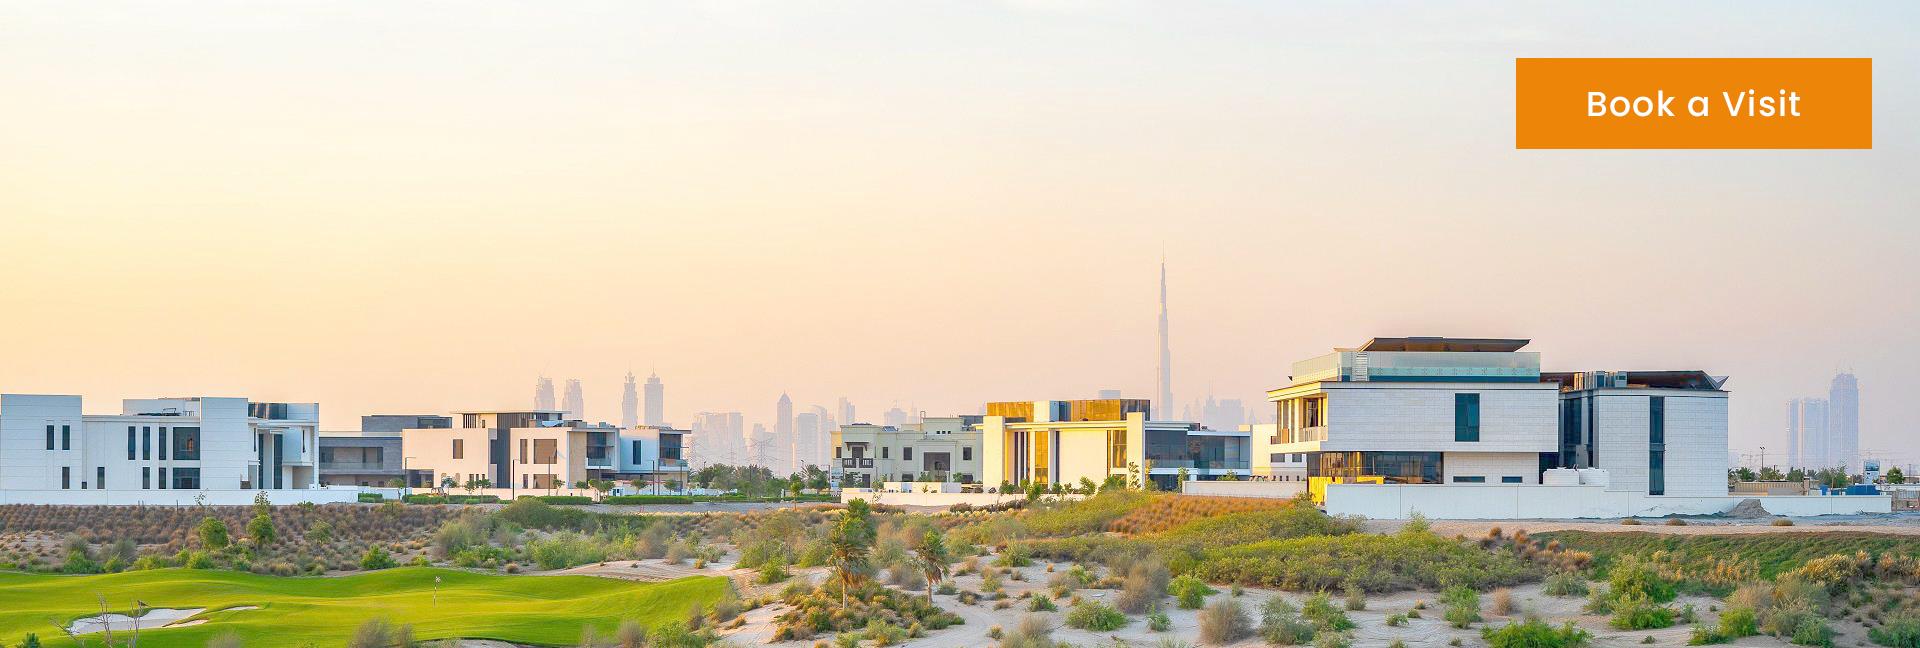 Dubai Hills Book Visit